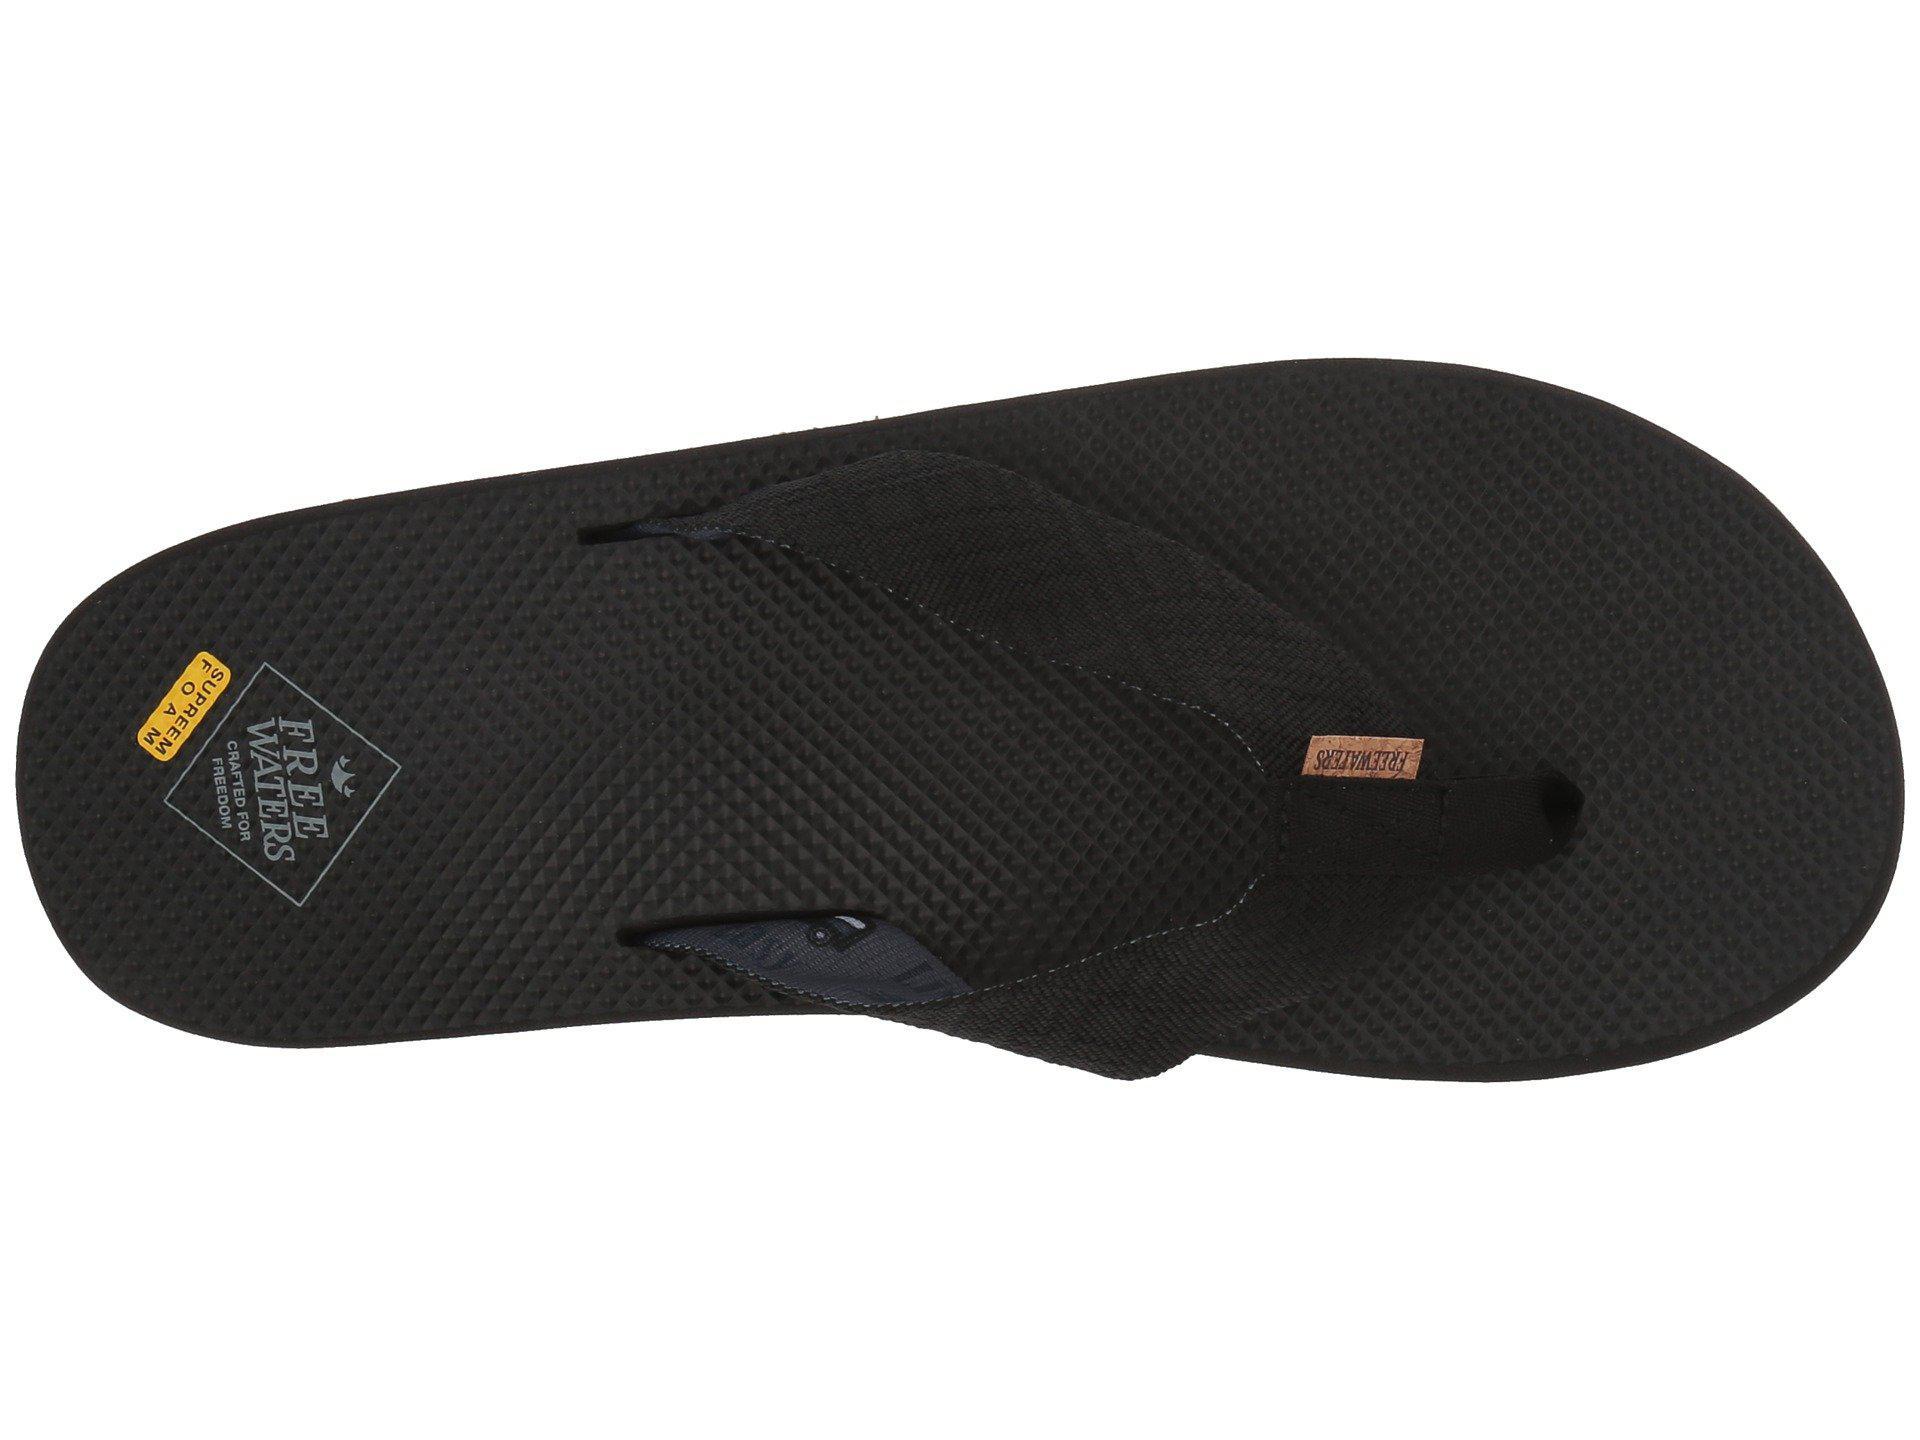 3e9071f5b14 Freewaters - Black Supreem Dude (brown) Men s Shoes for Men - Lyst. View  fullscreen